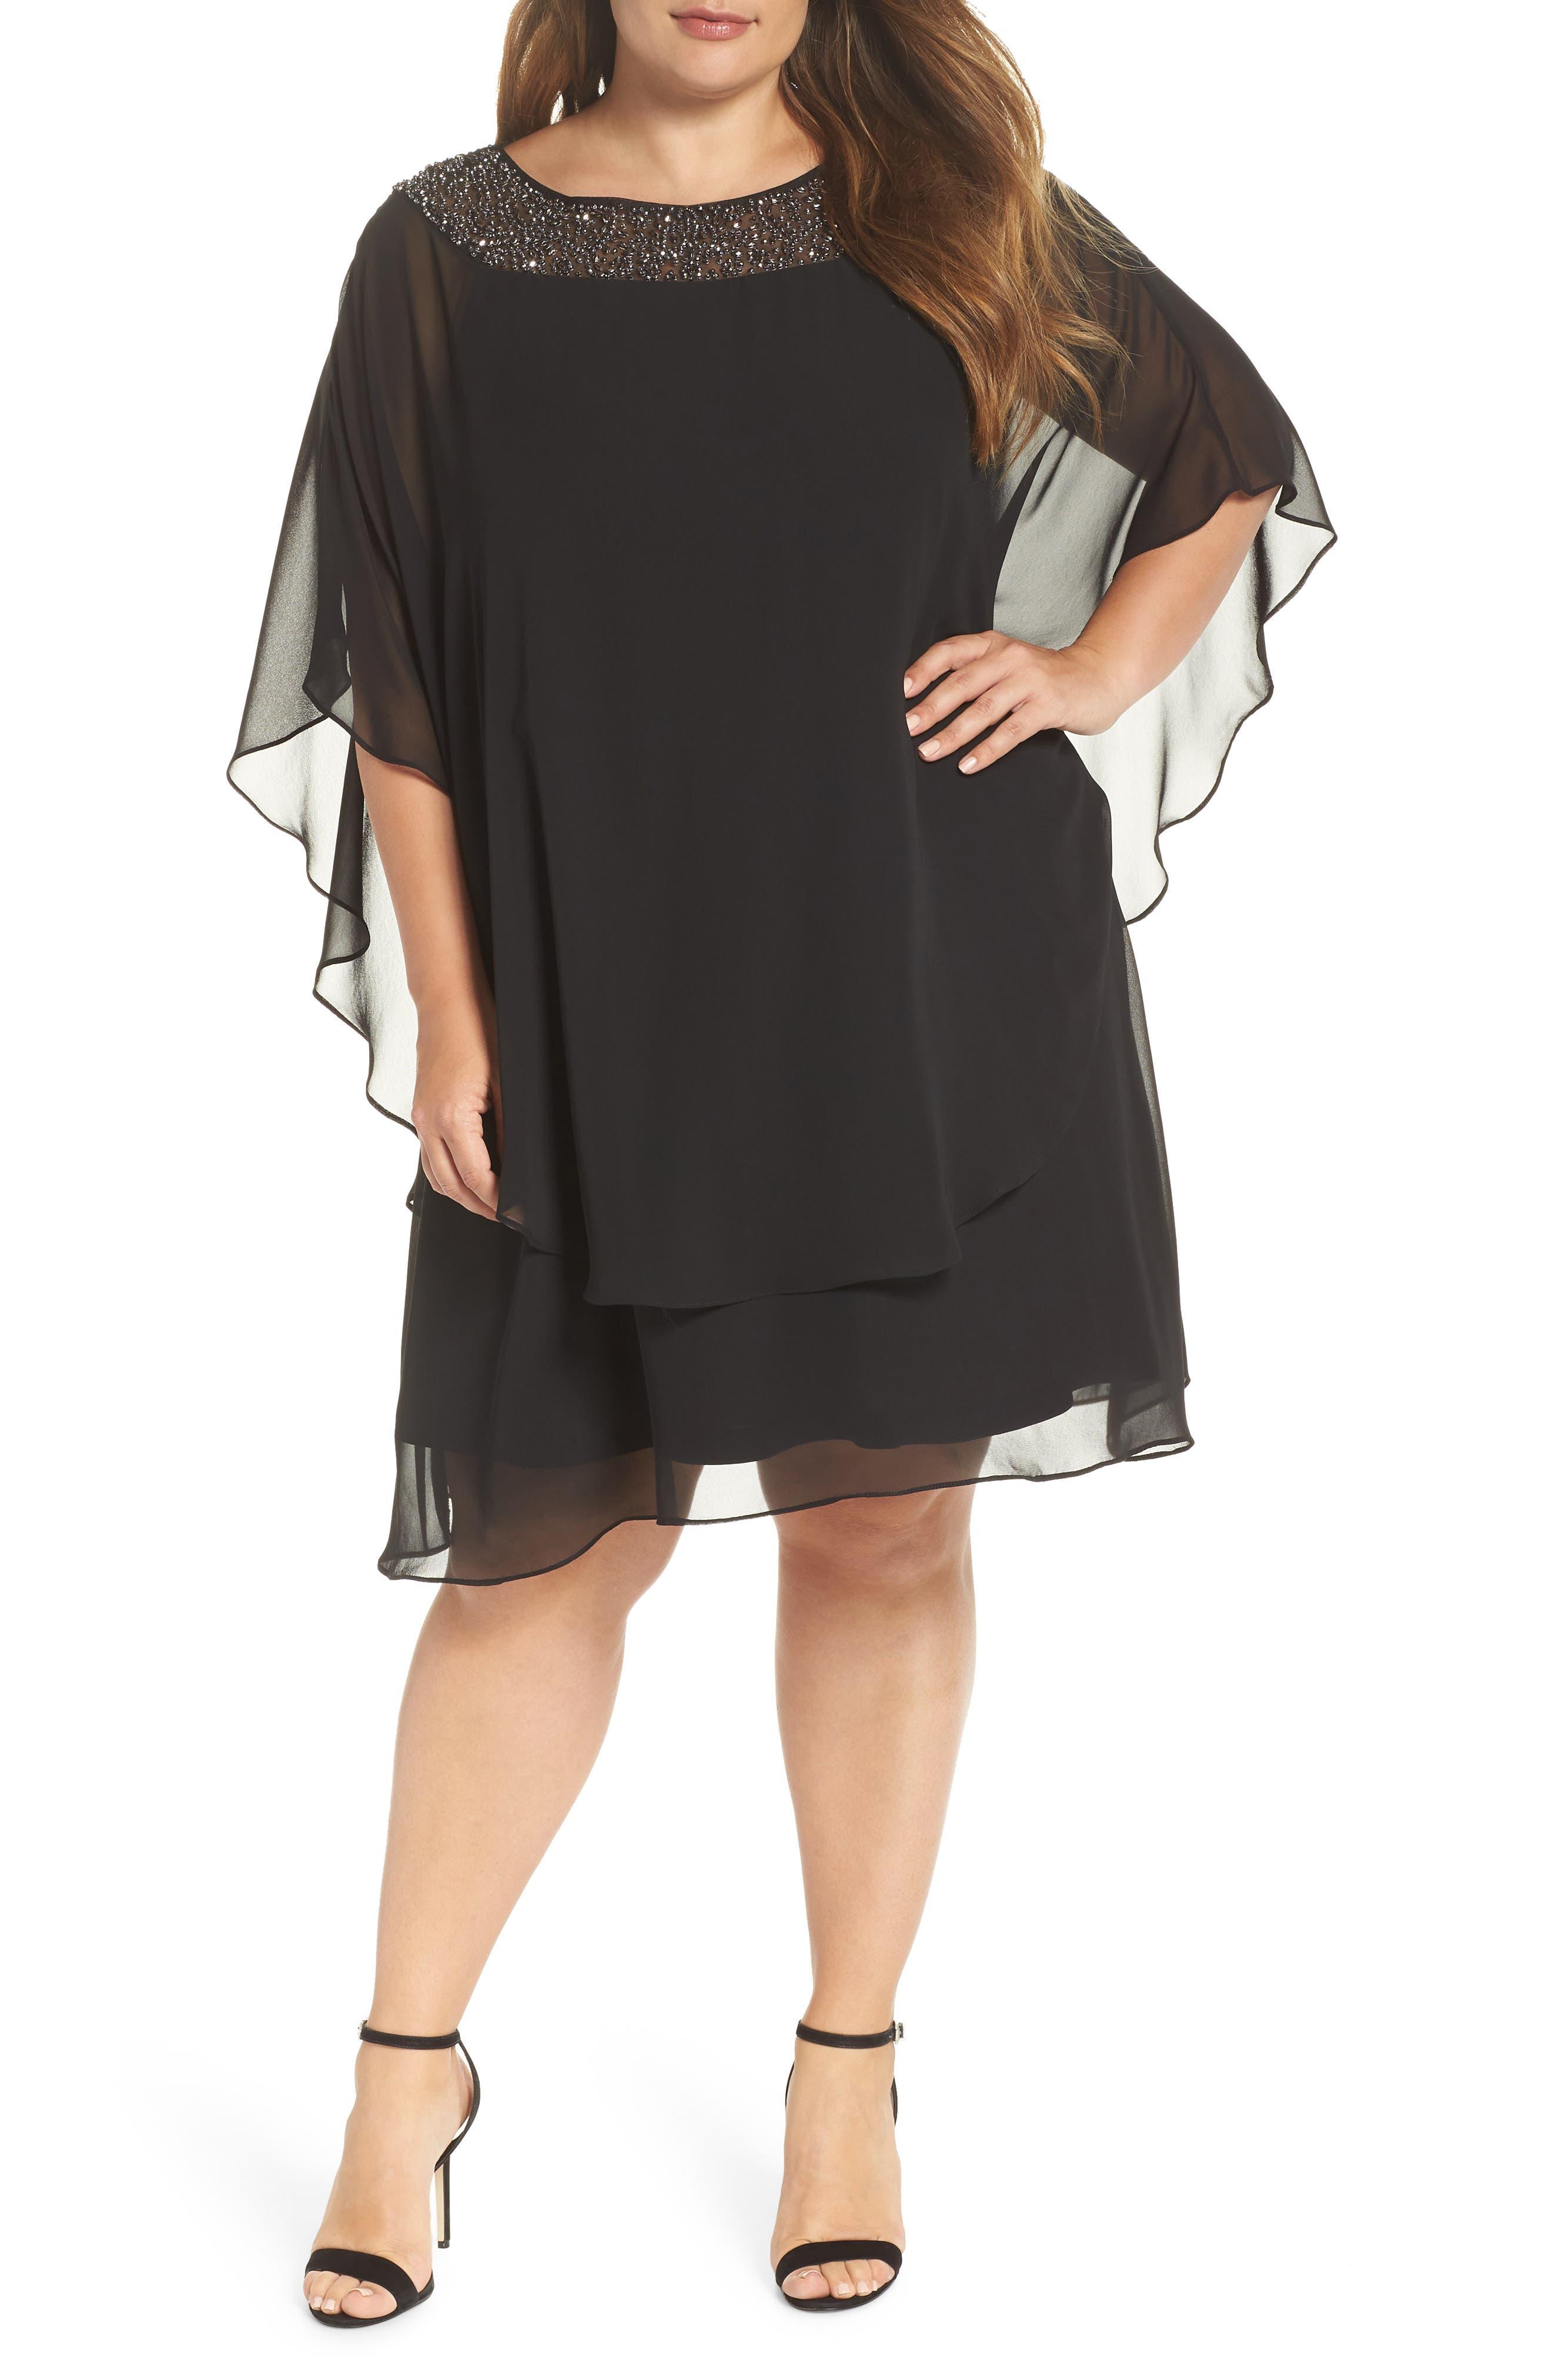 Beaded Neck Chiffon Overlay Dress,                             Main thumbnail 1, color,                             BLACK/ GUNMETAL